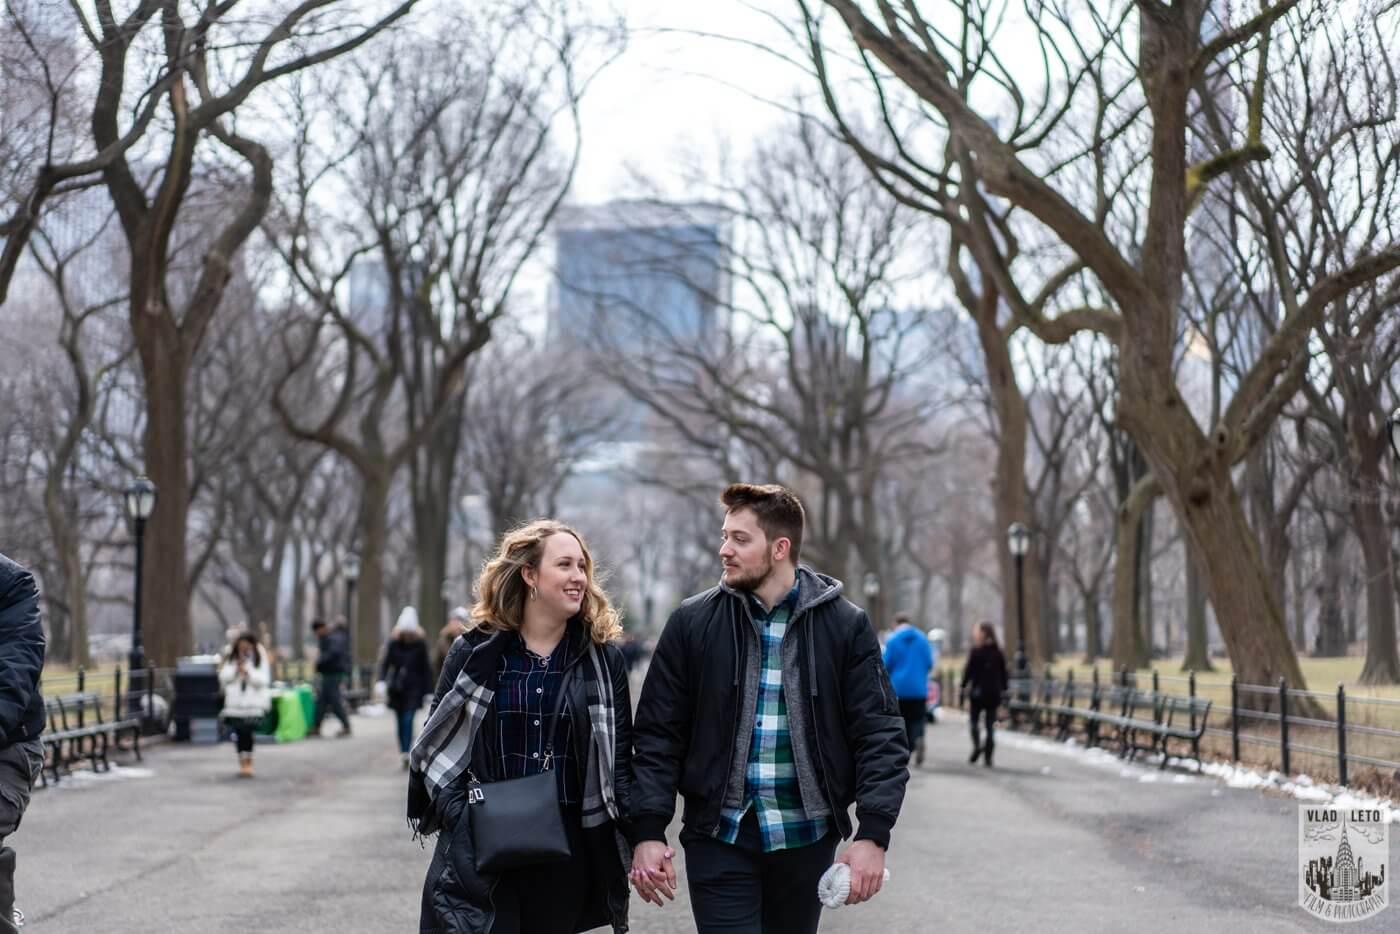 Photo 7 Bow bridge wedding proposal in Central Park | VladLeto